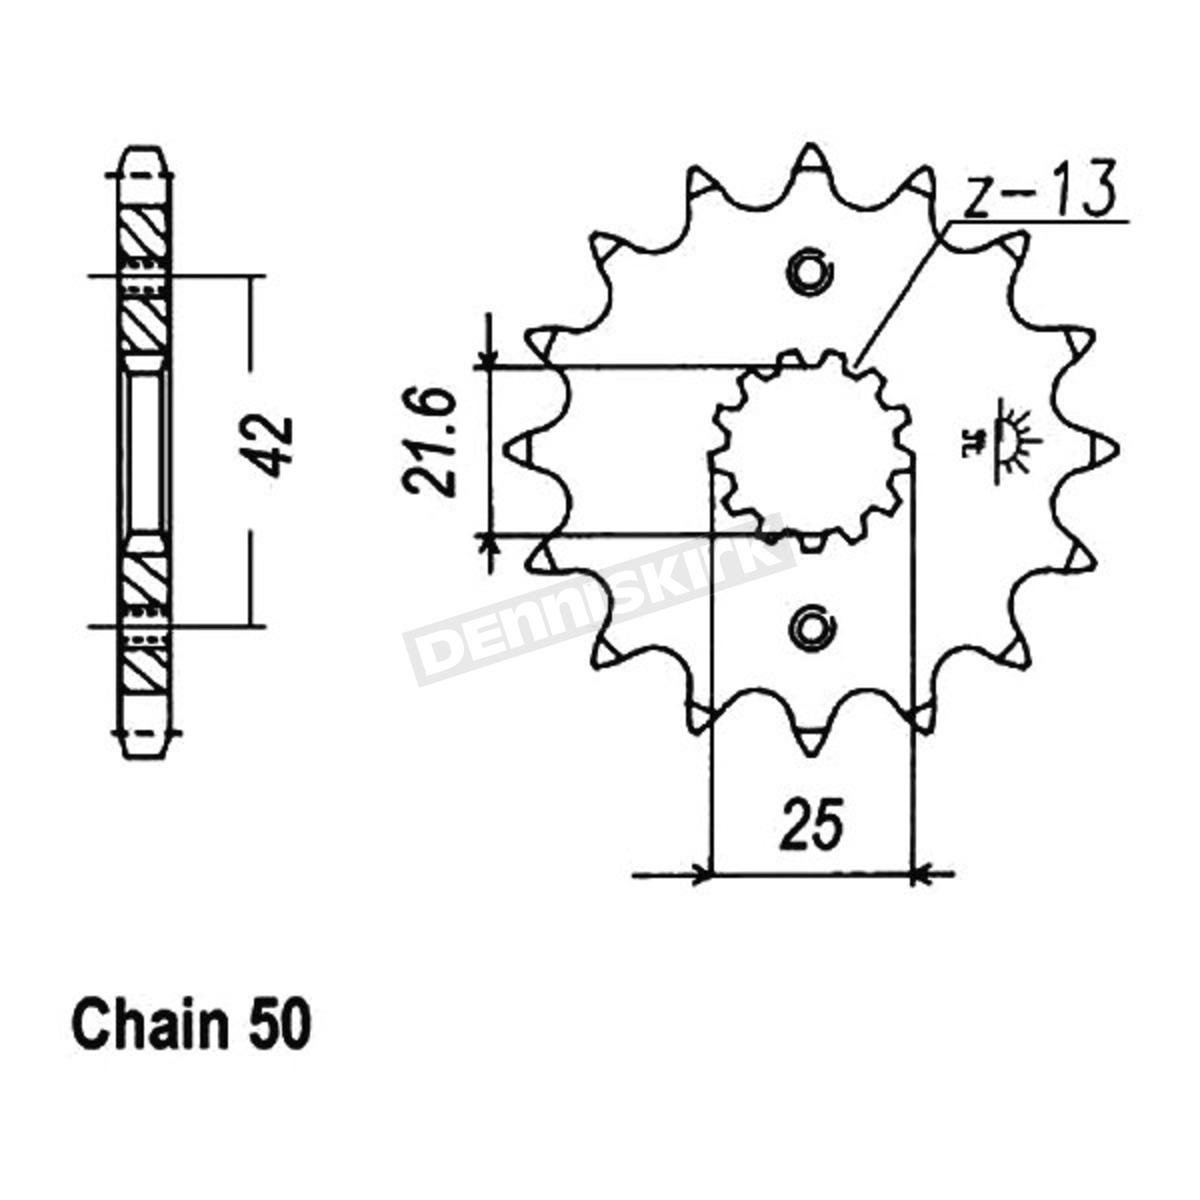 2002 Suzuki Volusia Intruder Vl800 Custom Wiring Diagrams